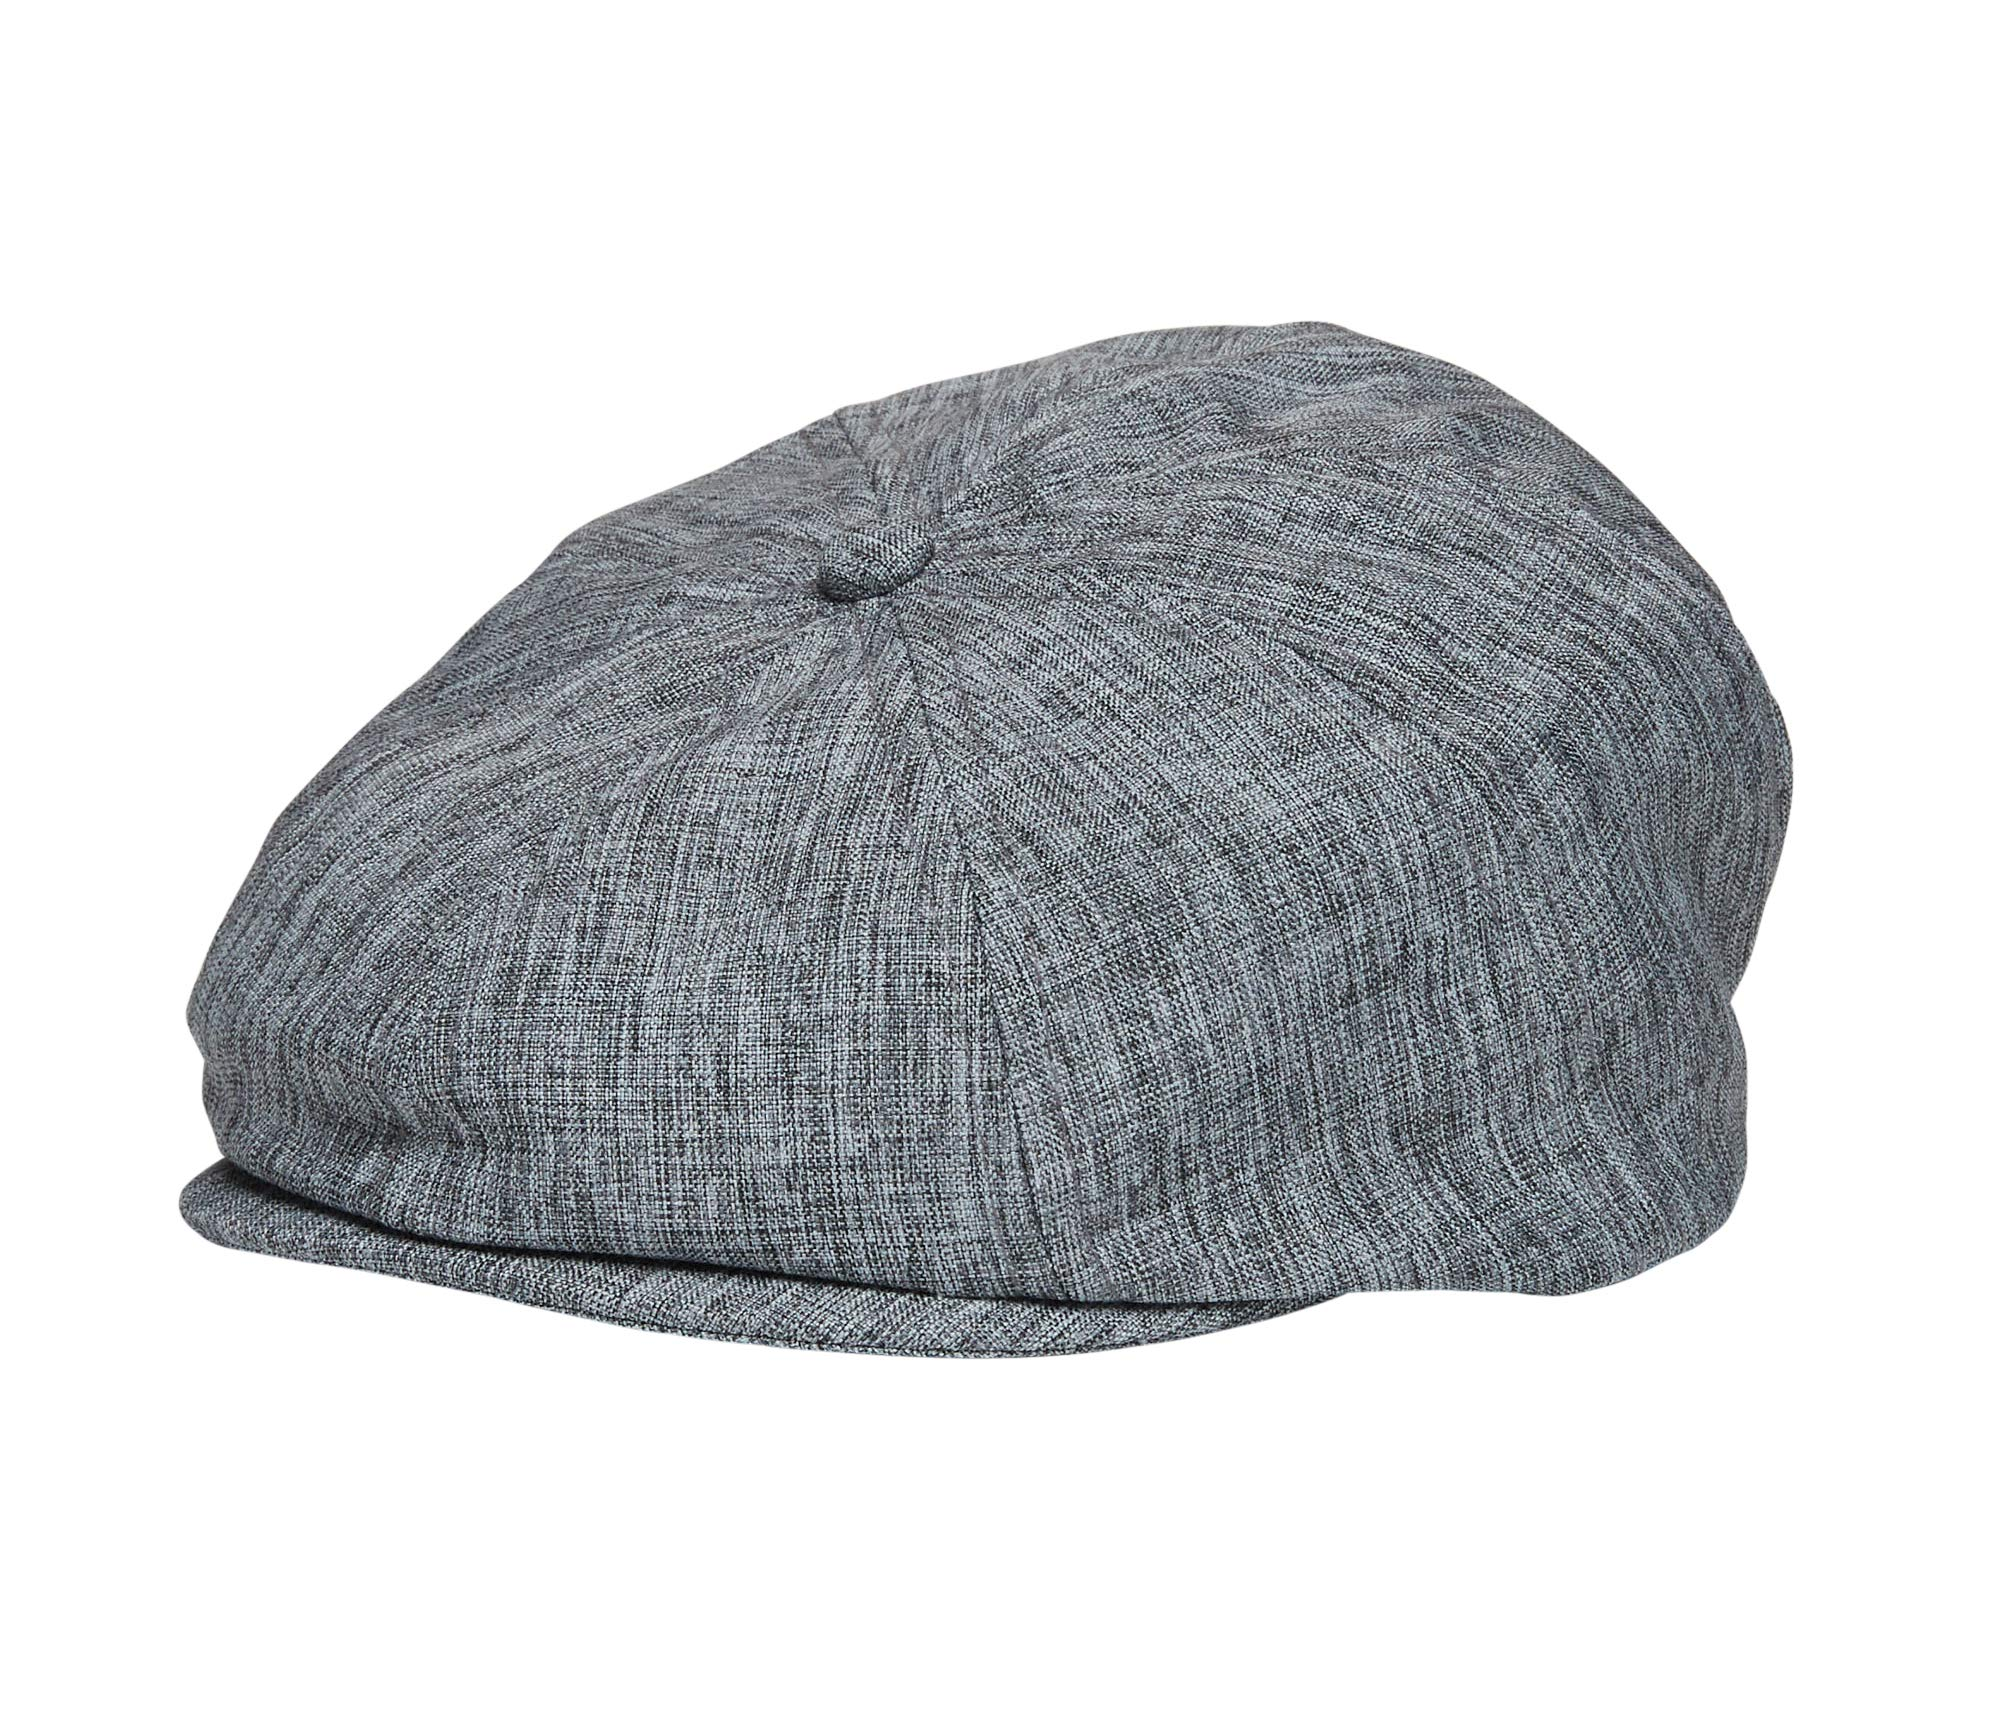 Baby Boy Ring Bearer Pageboy Scally Cap - Flat Ivy Newsboy Tweed Golf Cap Hat (Light Gray Set, XL 56cm)